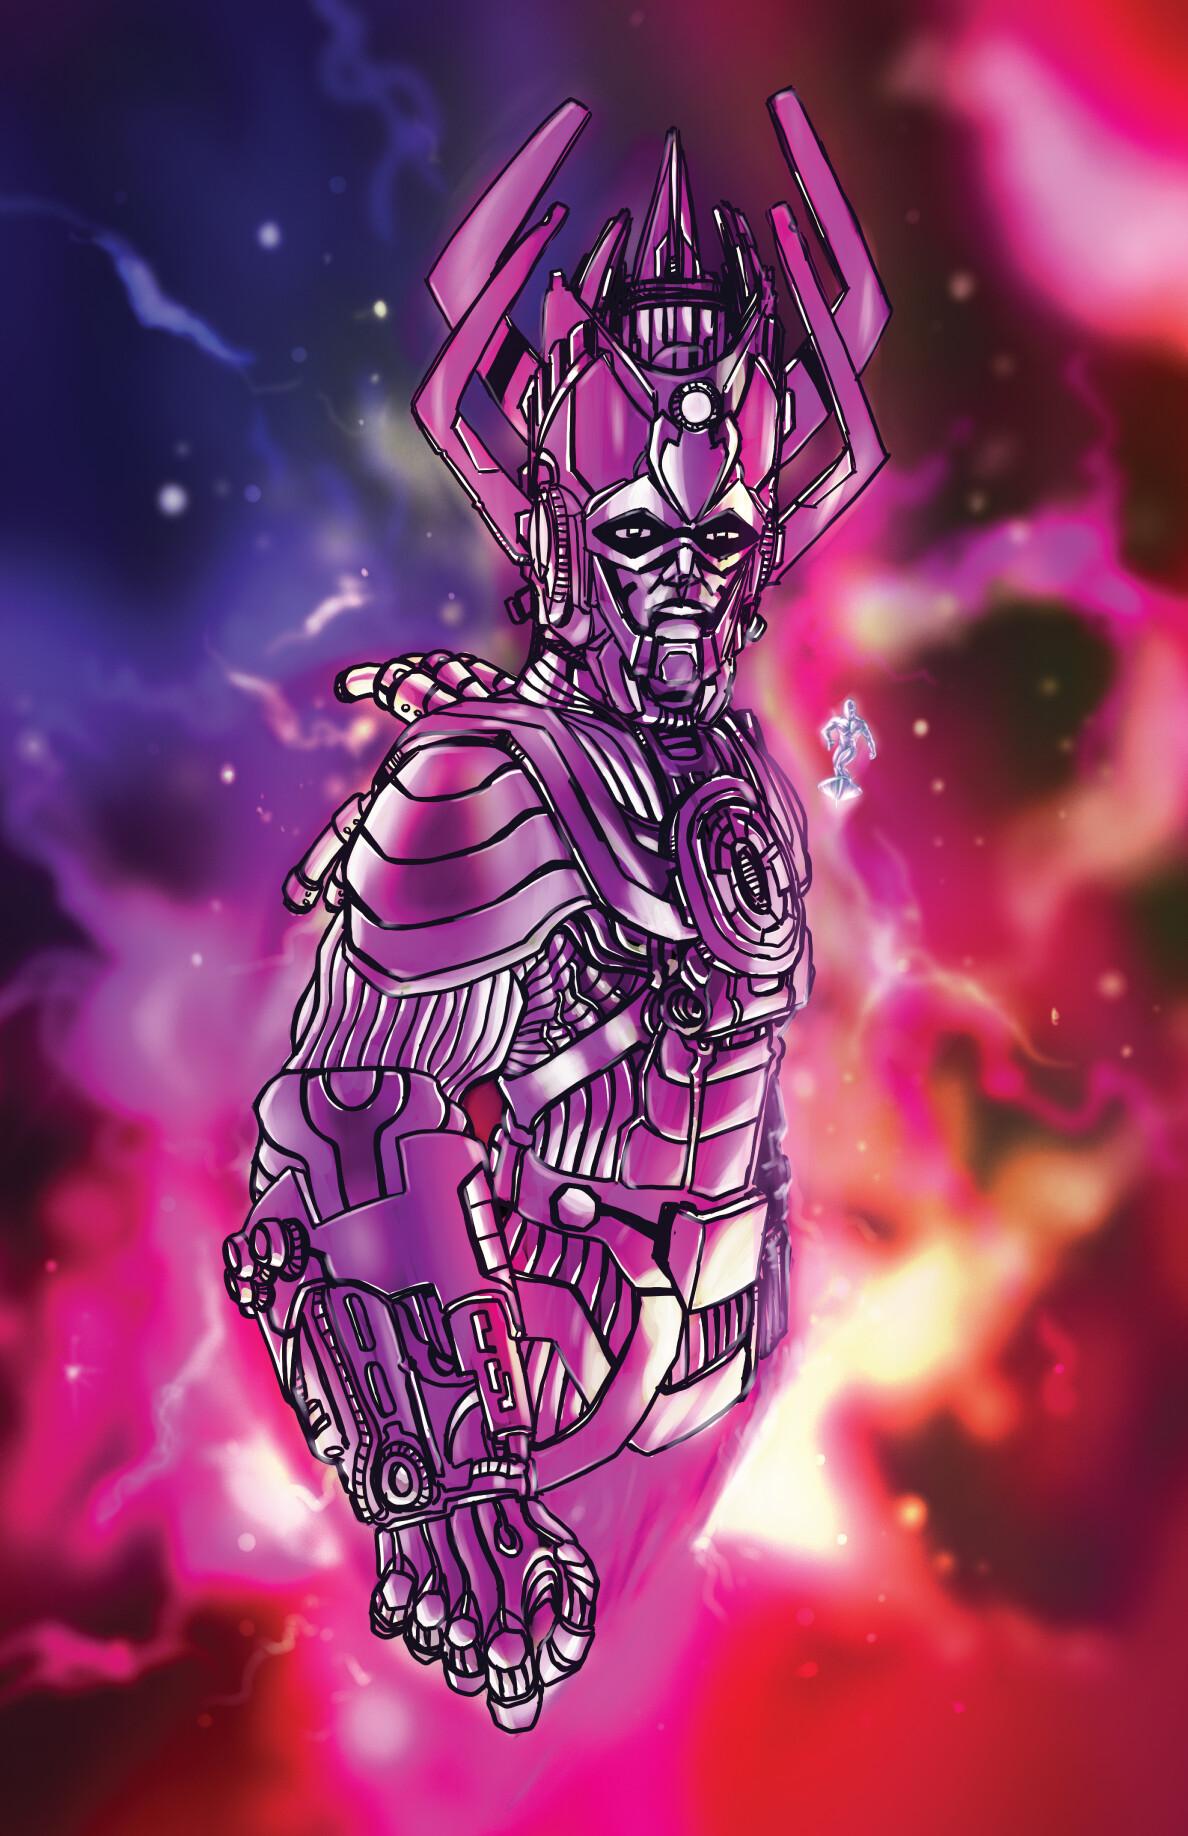 Loc nguyen 2019 01 31 galactus small